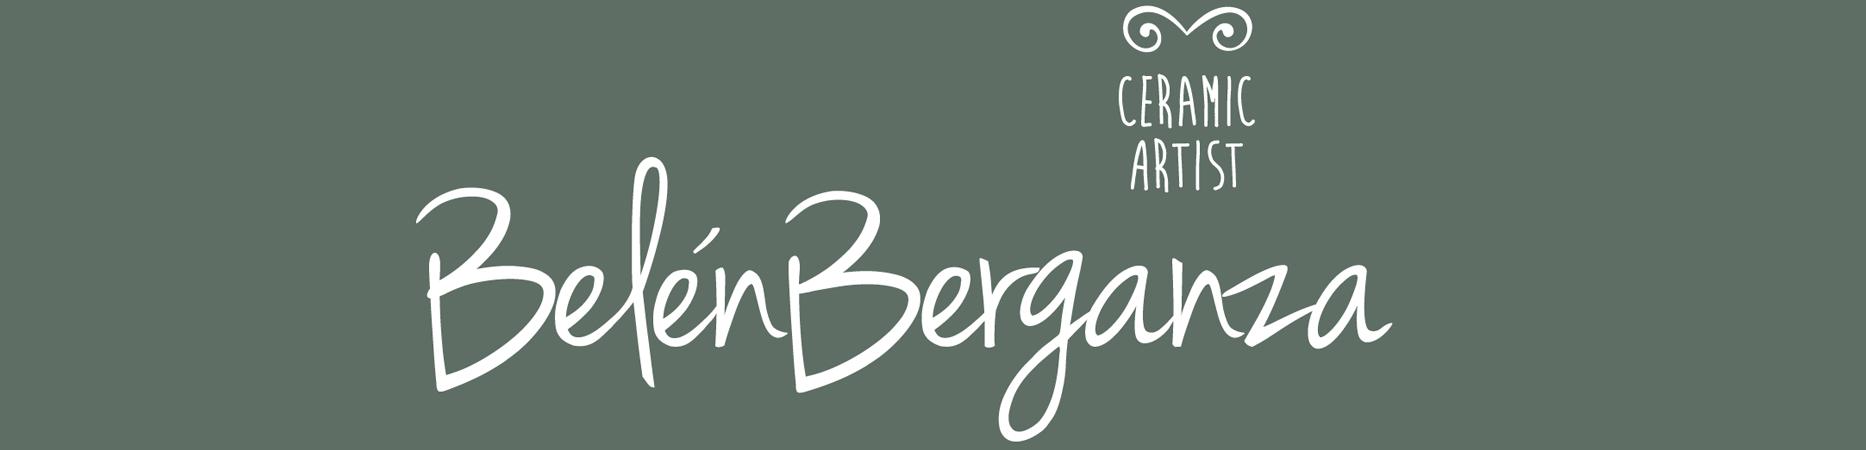 Belen Berganza